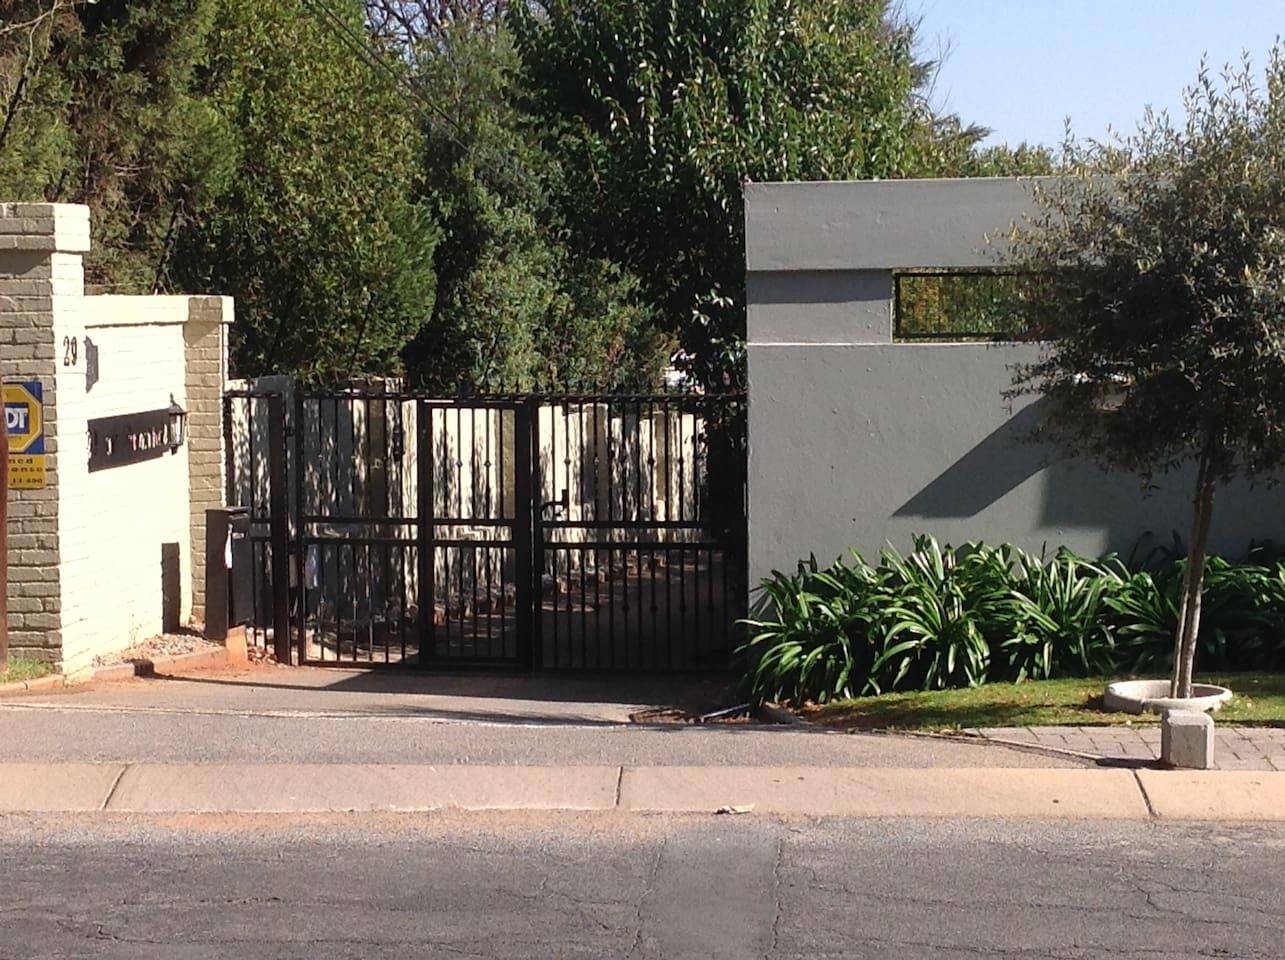 Entrance to 29 on Ormonde street property